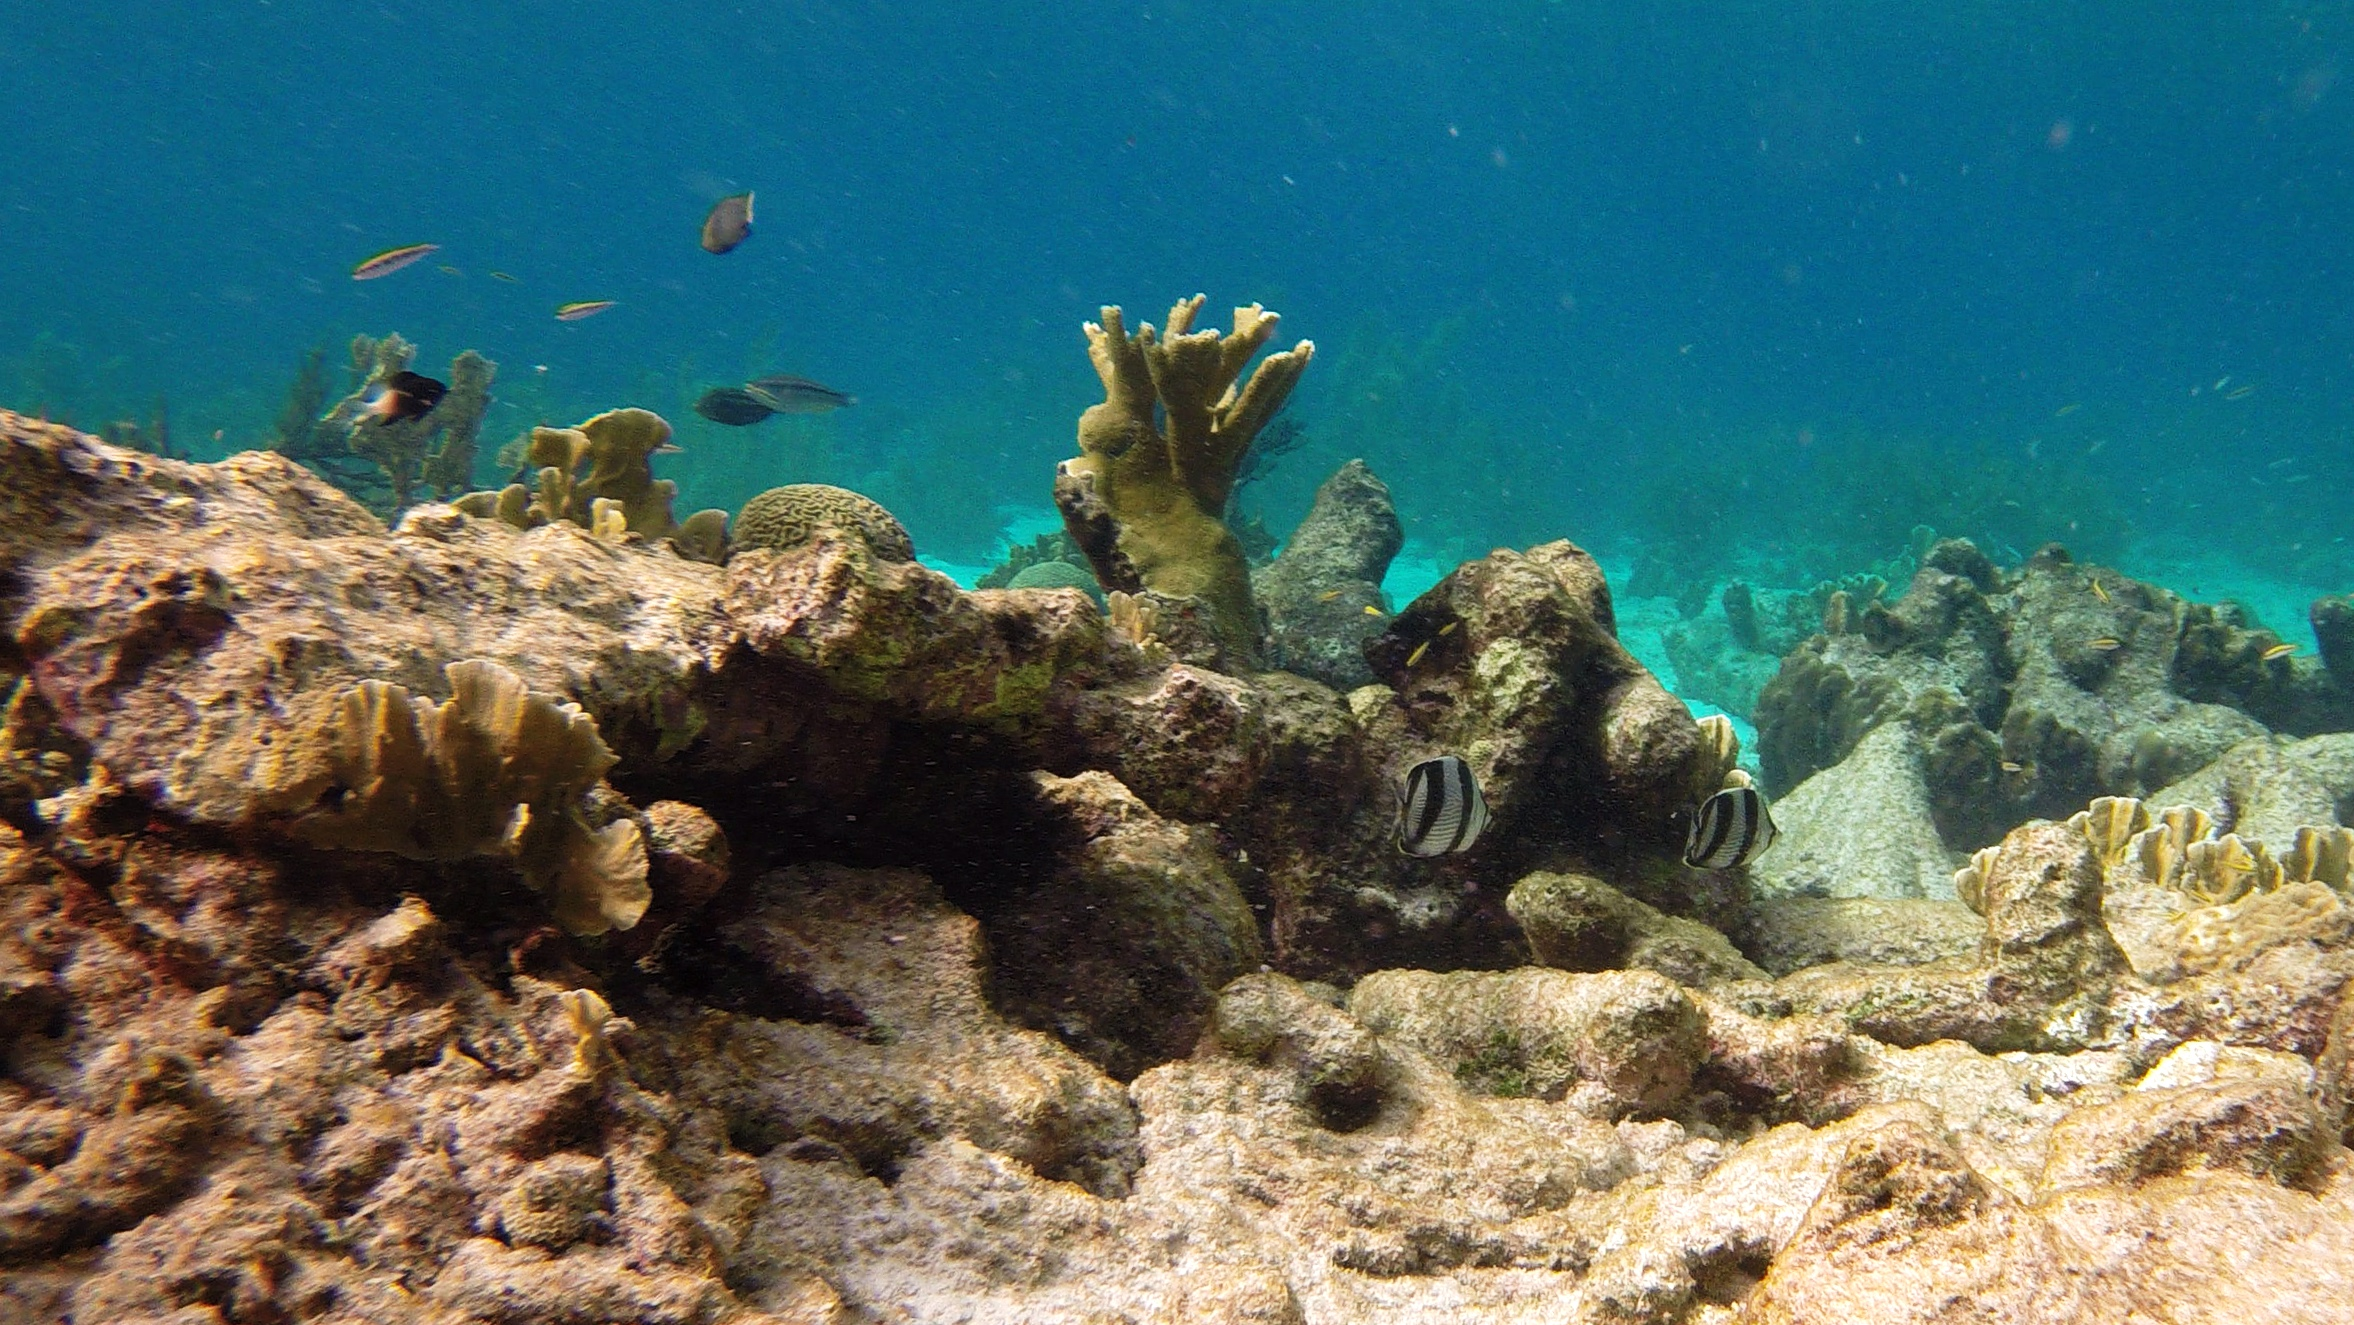 File:Snorkeling Karpata Reef, Bonaire (12841929245).jpg - Wikimedia ...